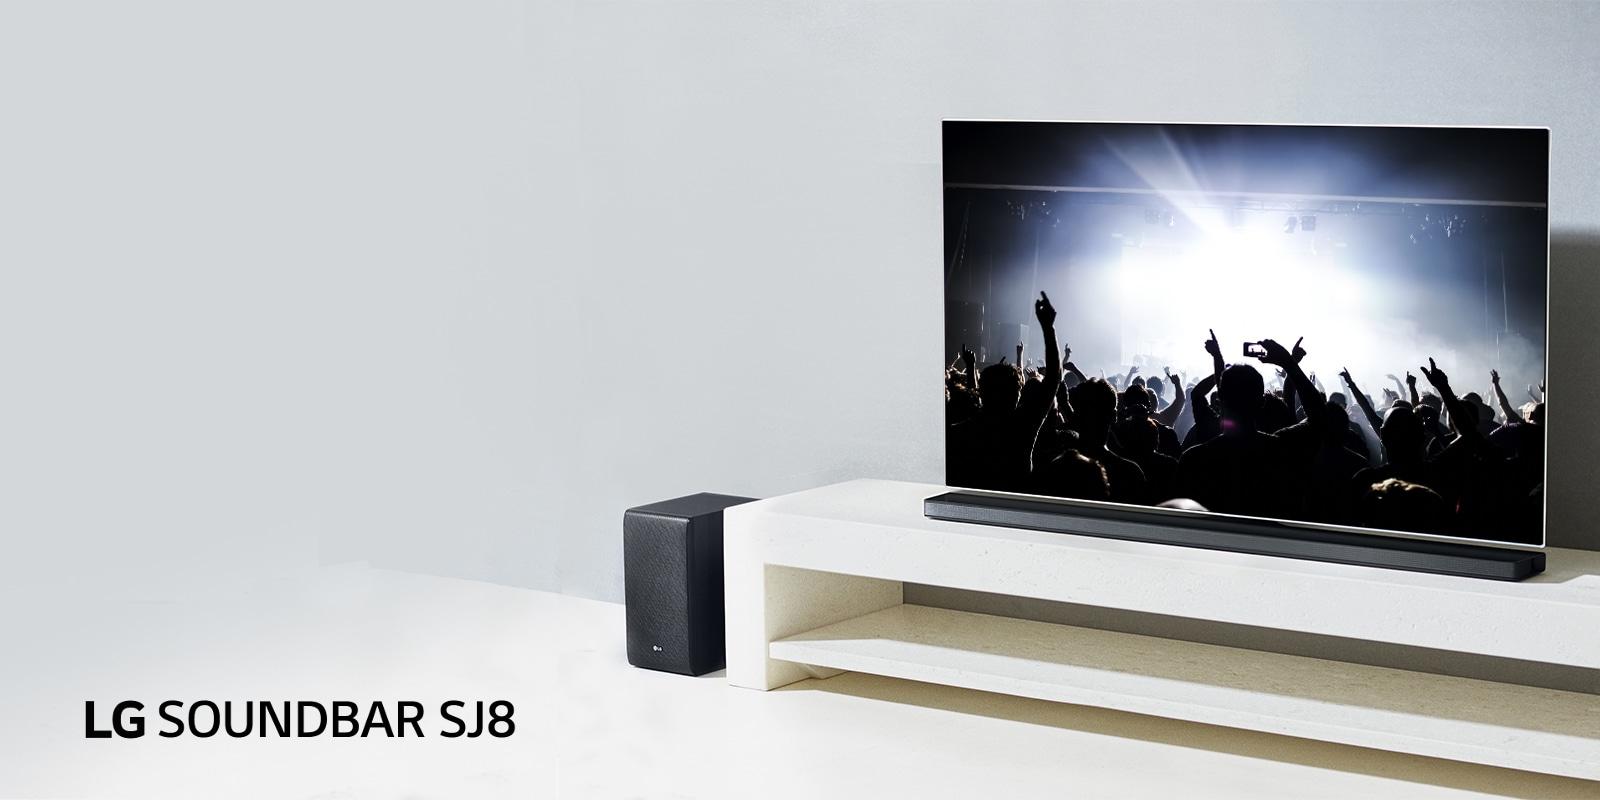 videoporno gay gratis film gratis tv